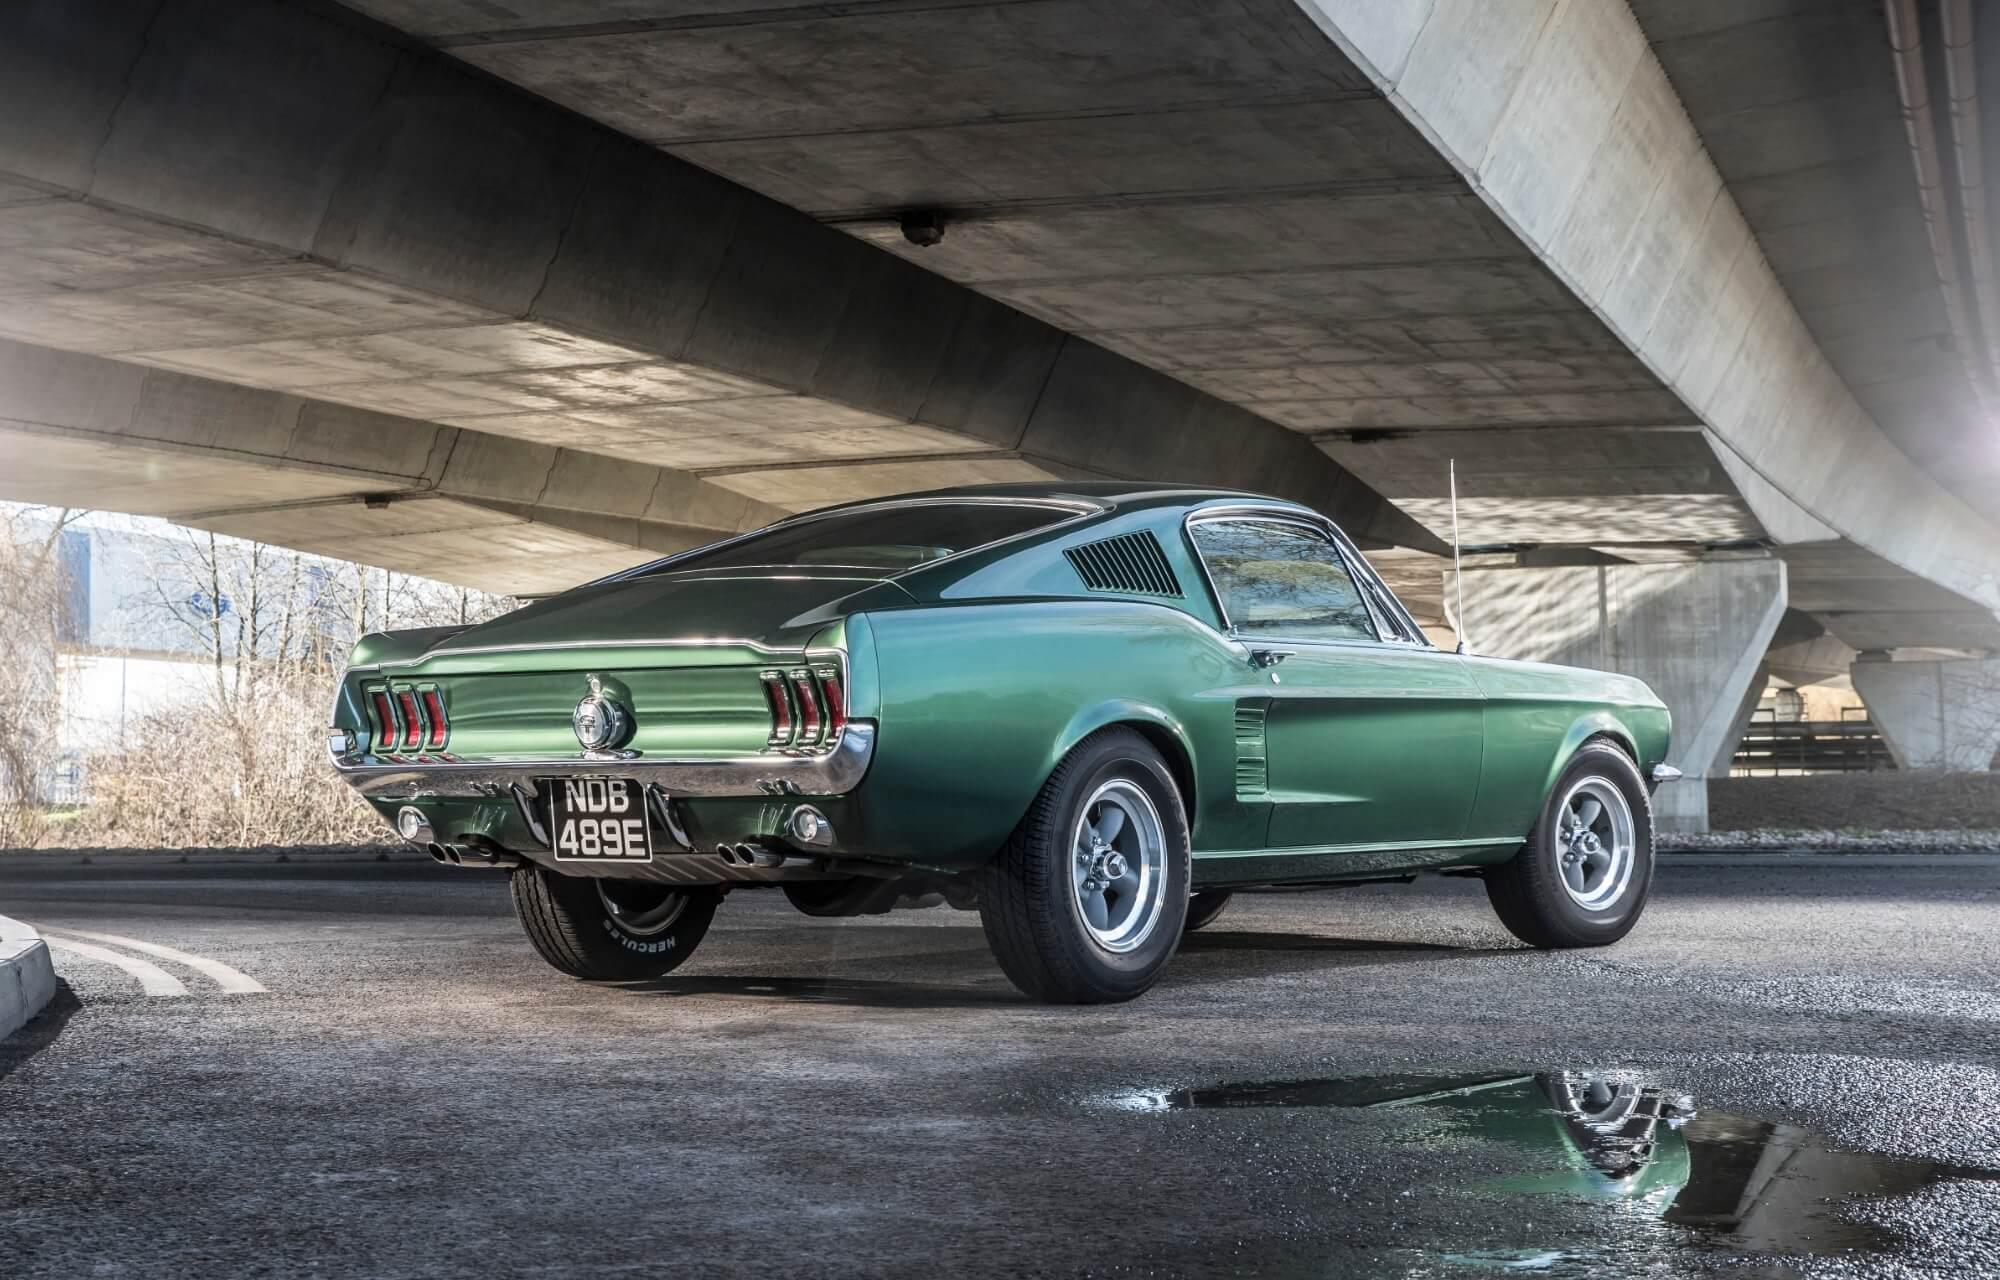 Première génération Mustang Bullit